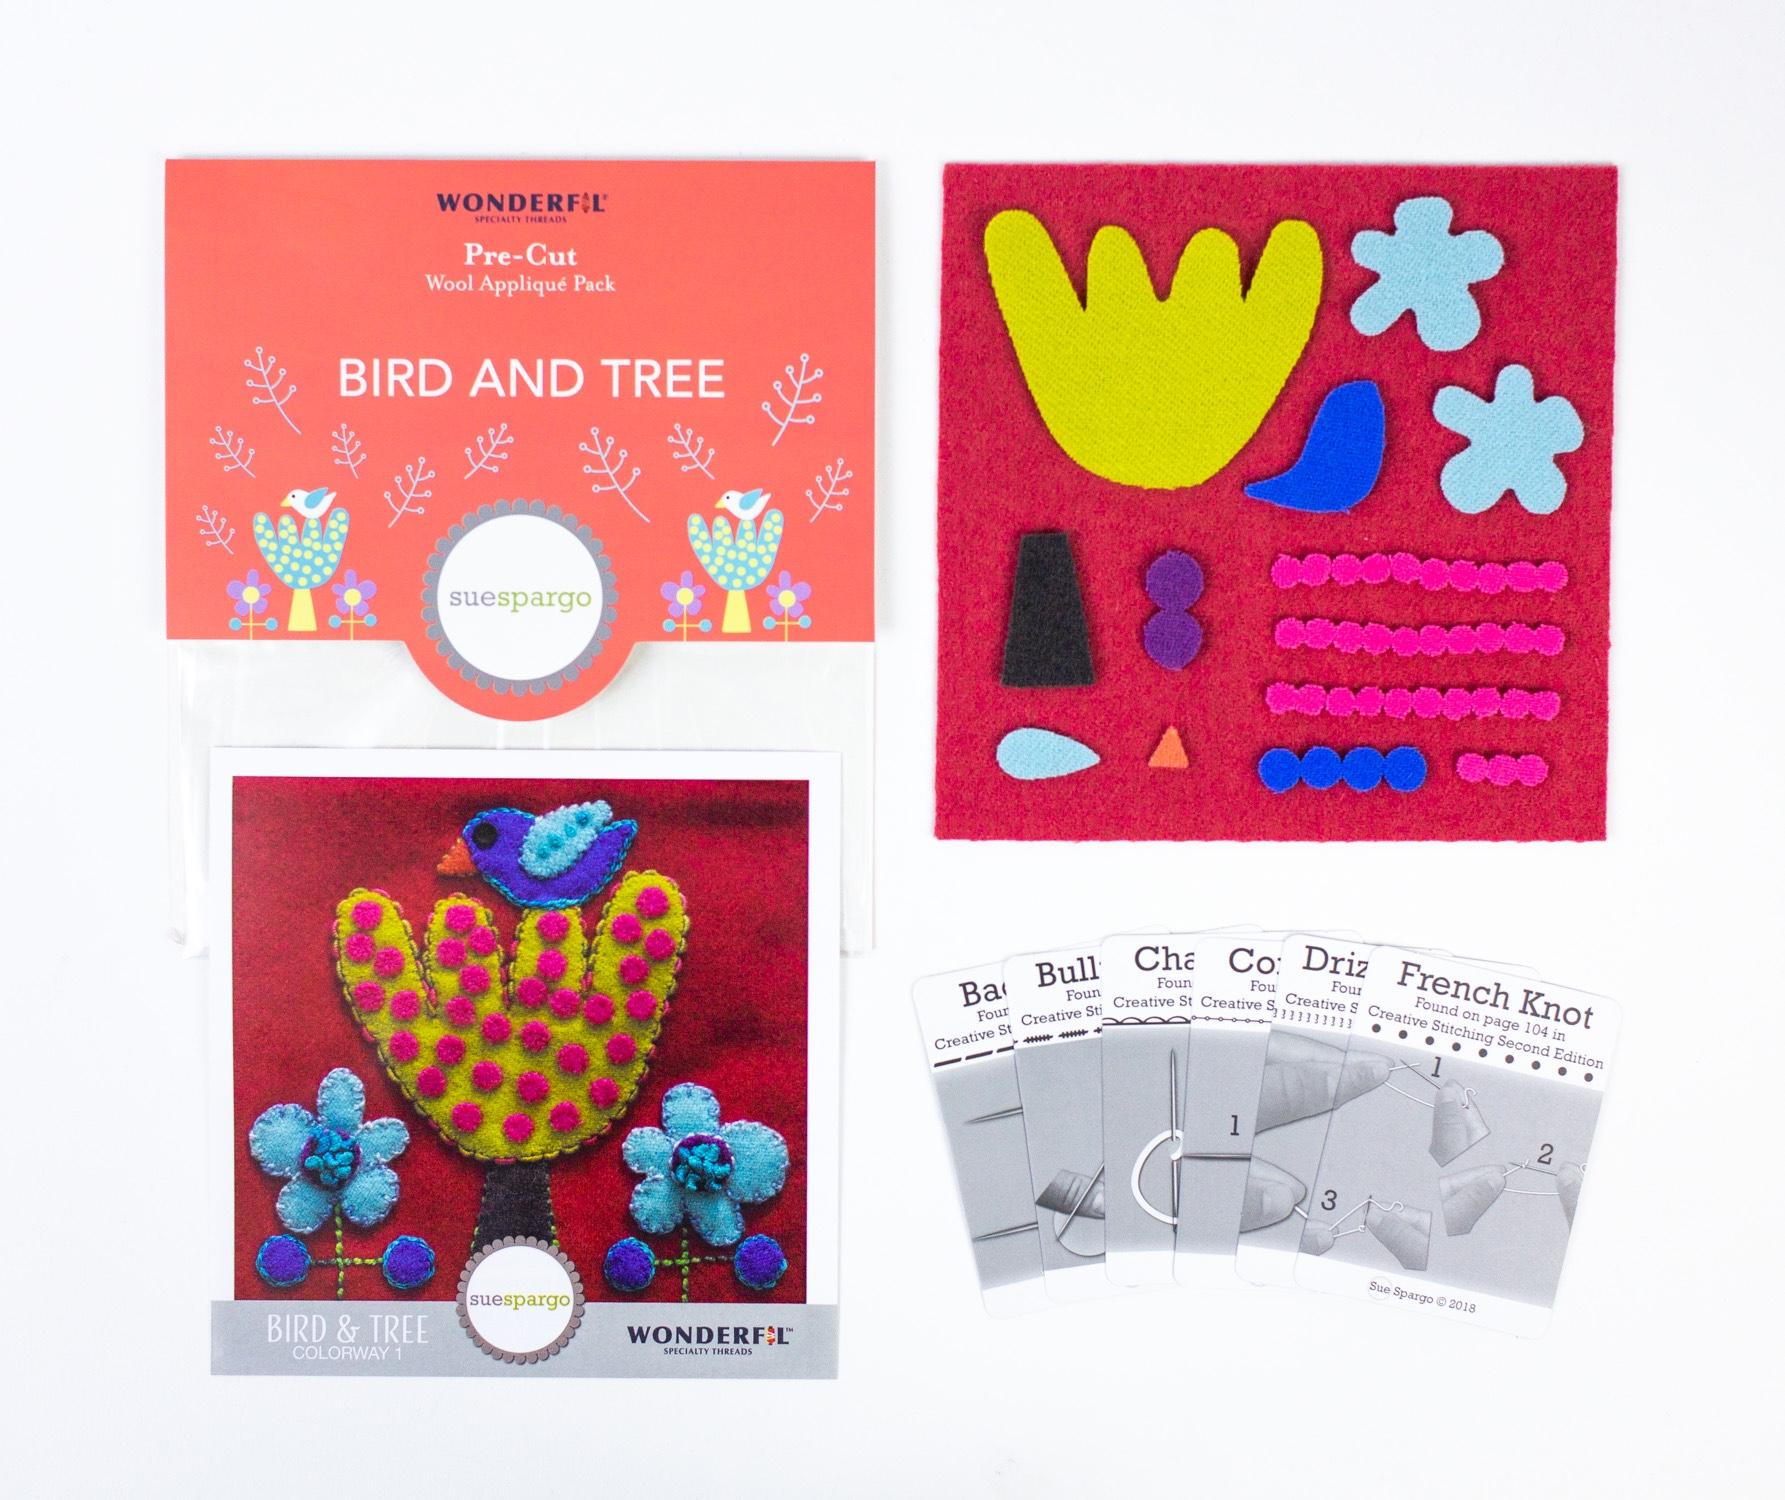 Bird and Tree1-inside.jpg